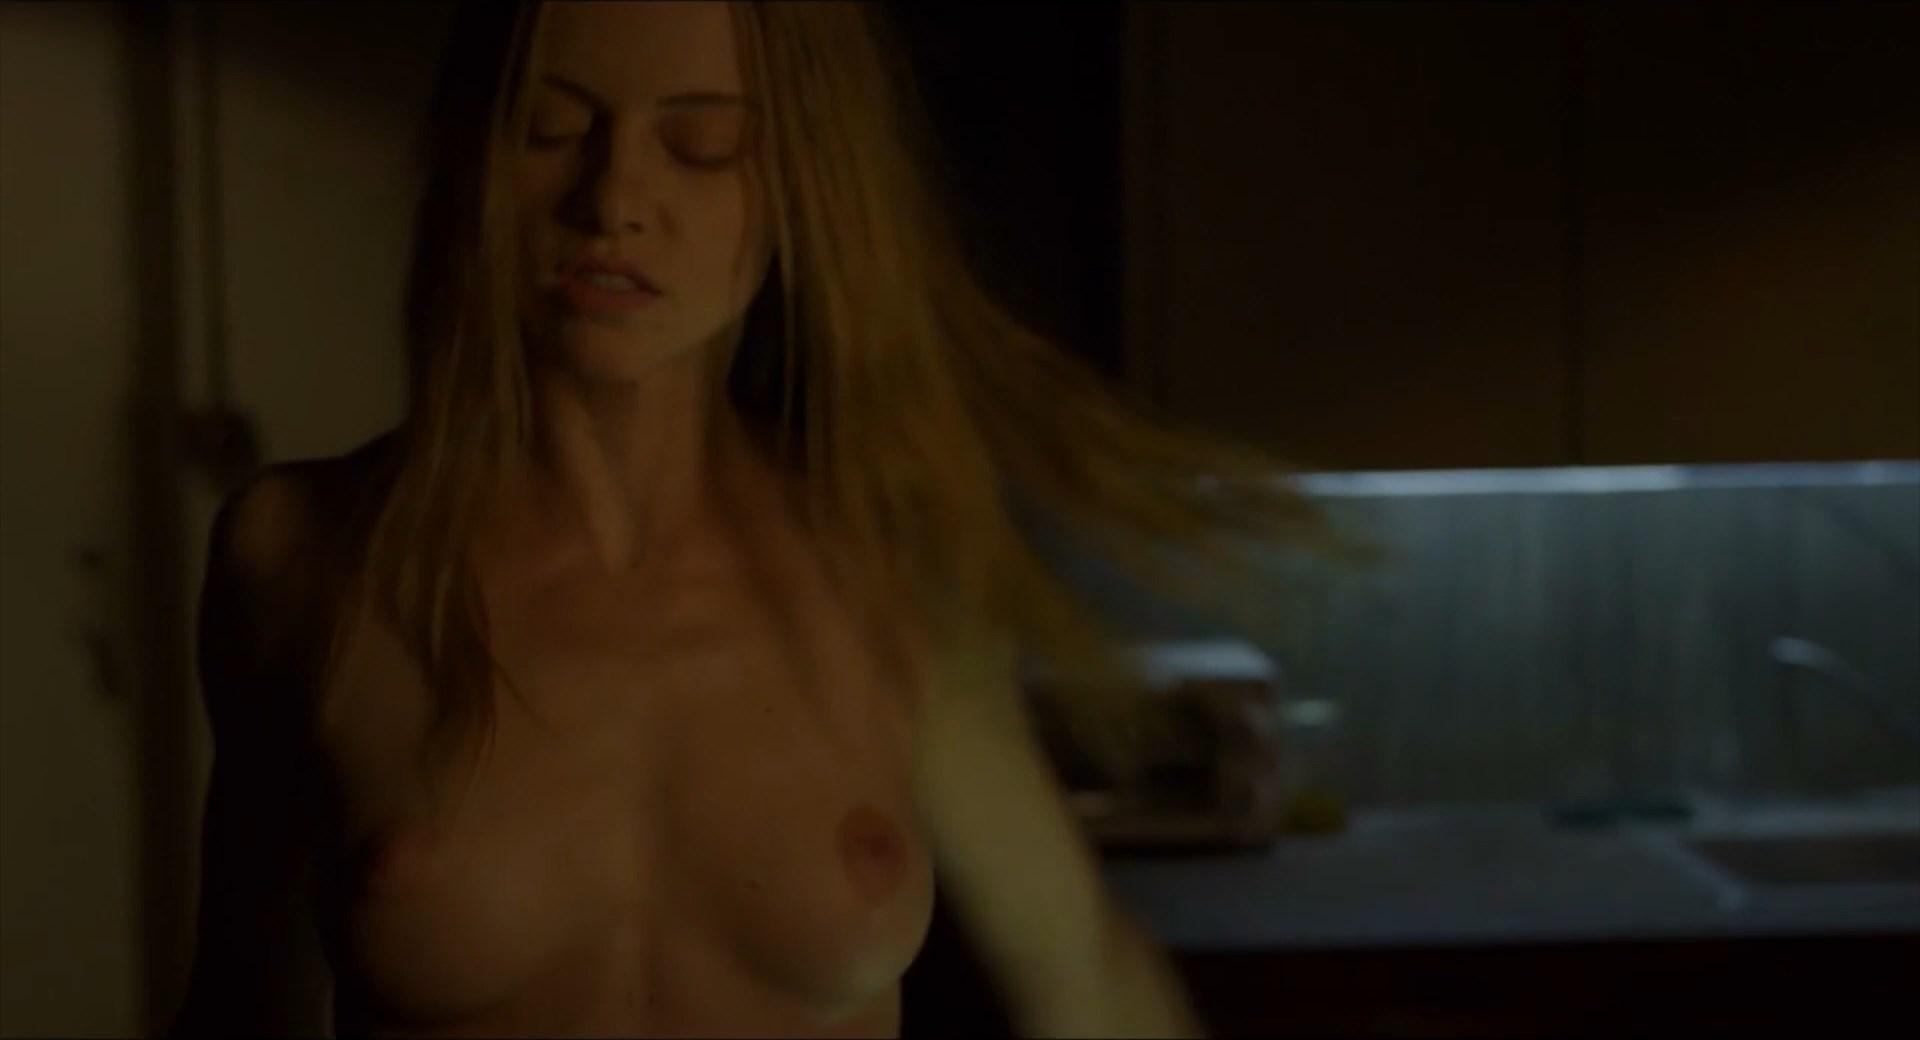 Nude Video Celebs Elle Evans Nude Muse 2017